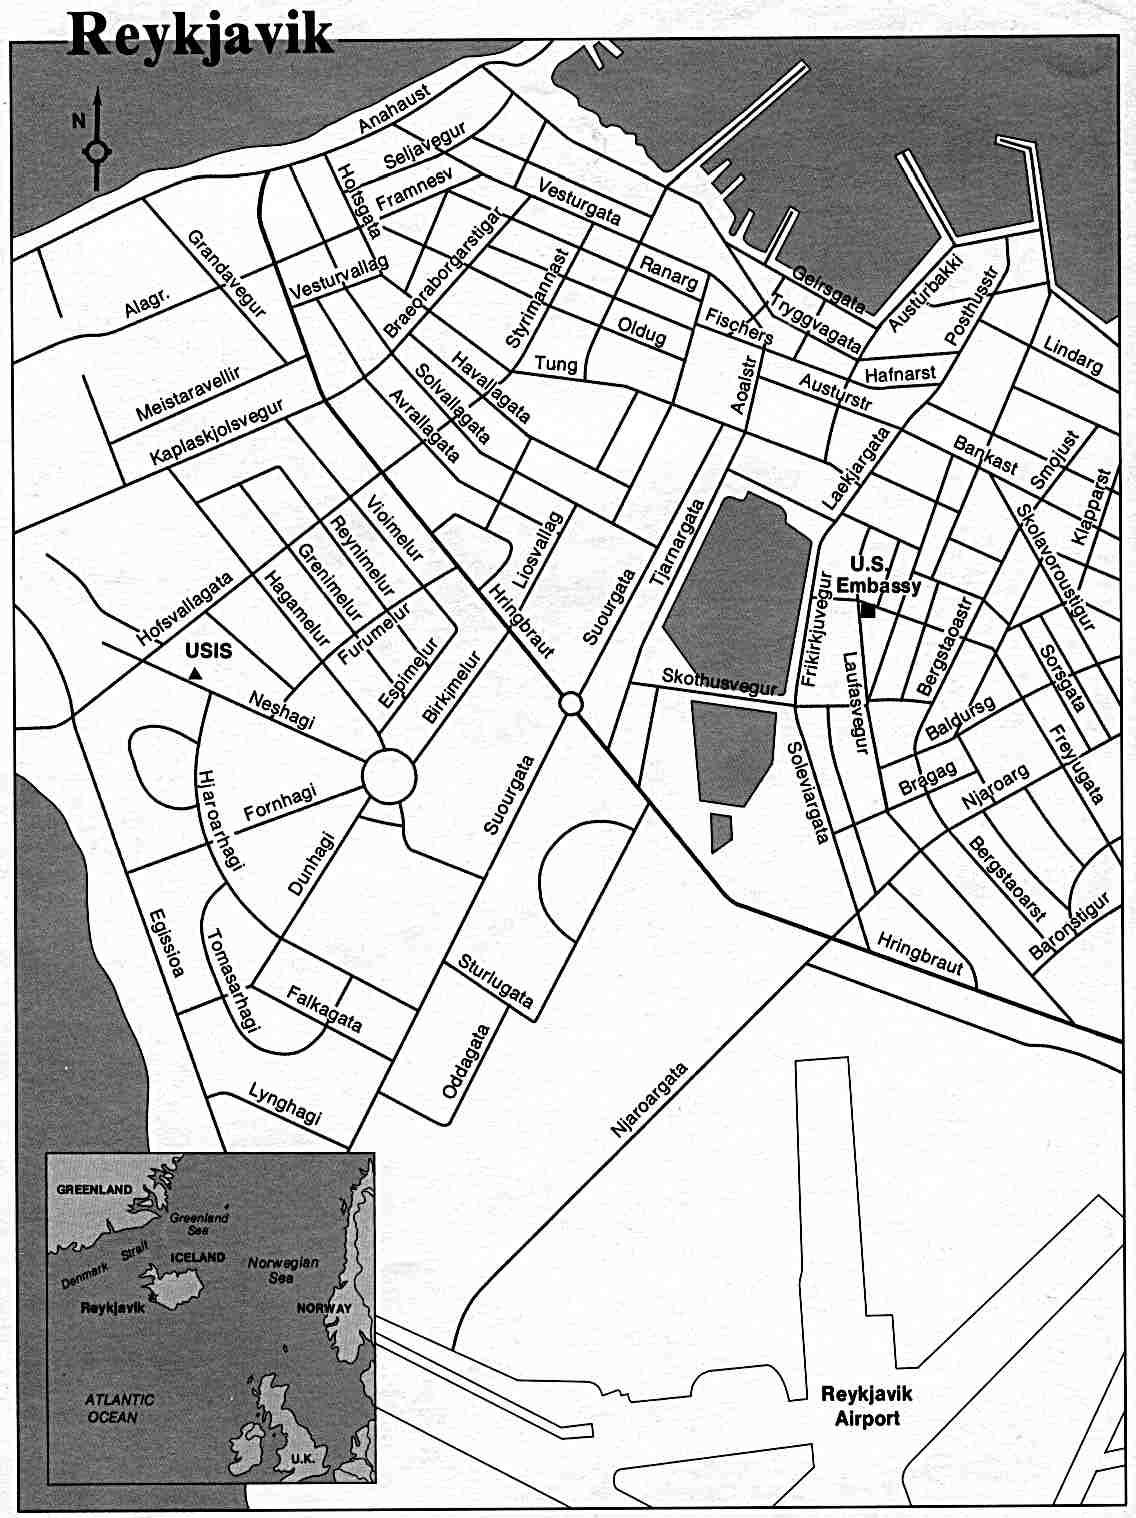 Reykjavik City Map, Iceland